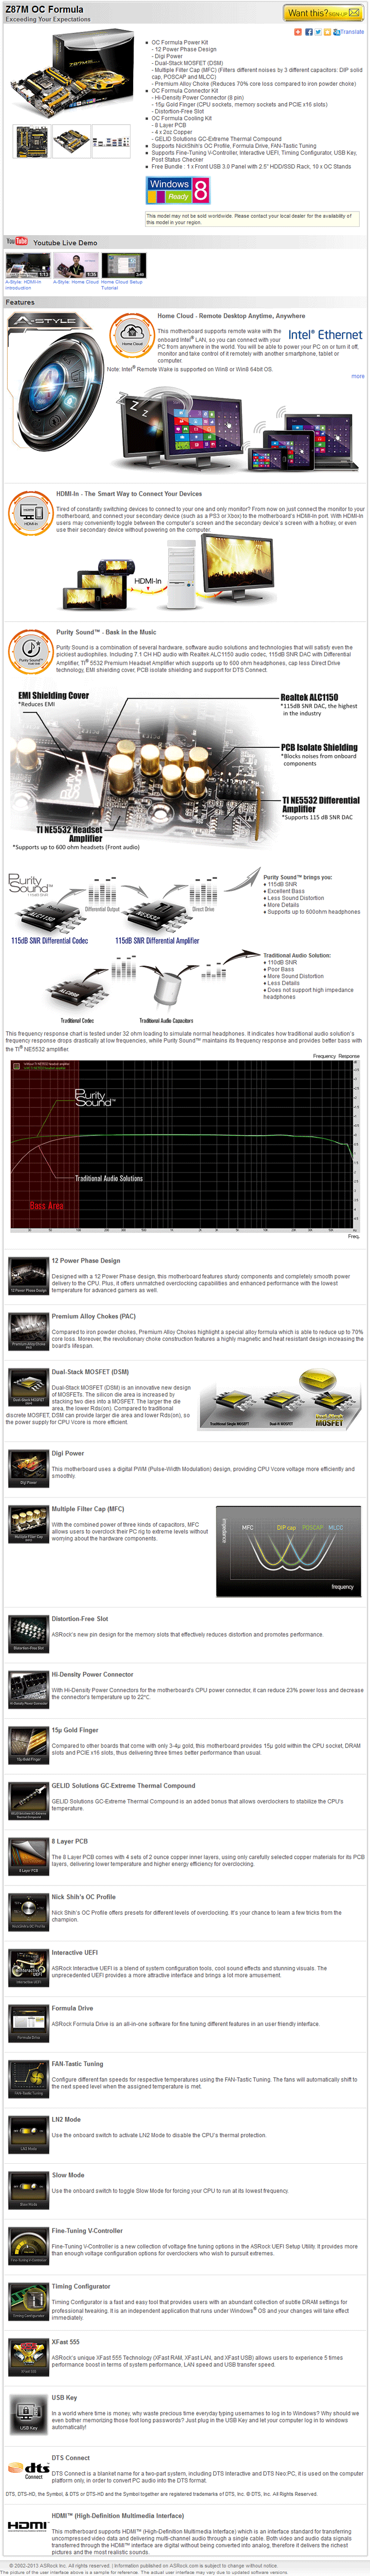 s1 ASRock Z87M OC Formula Micro ATX Motherboard Review เวรี่ควิกเทสต์